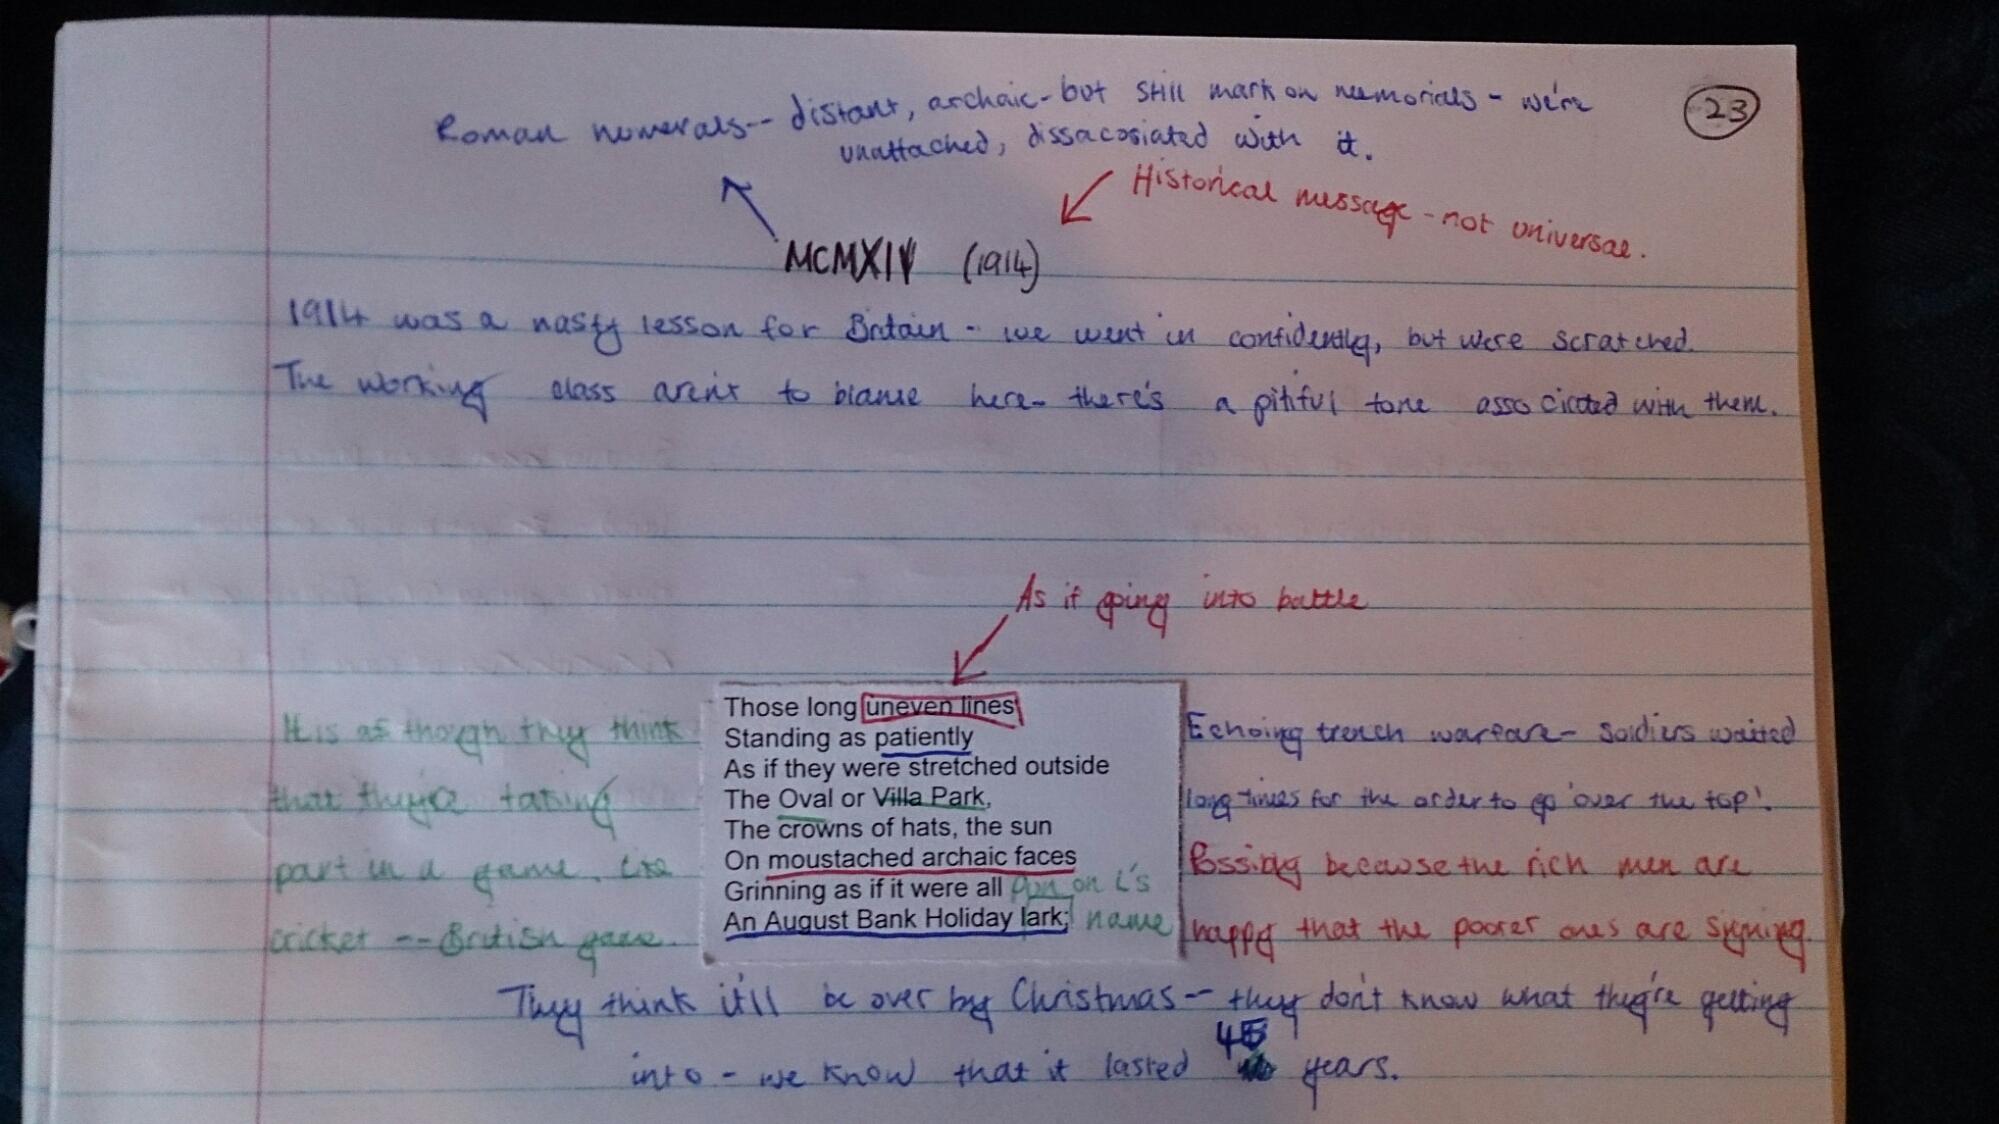 mcmxiv analysis essay